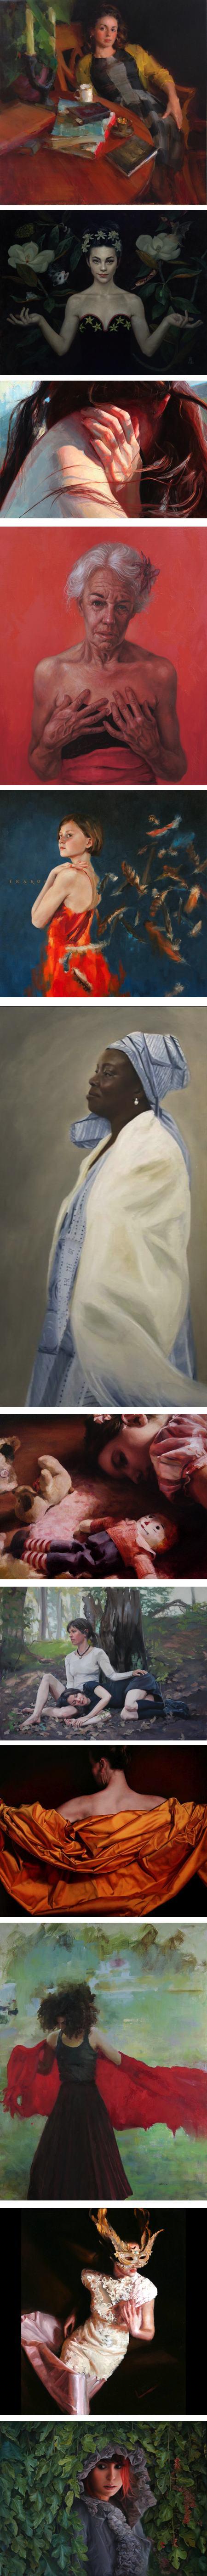 Women Painting Women at Principle Gallery, Charleston